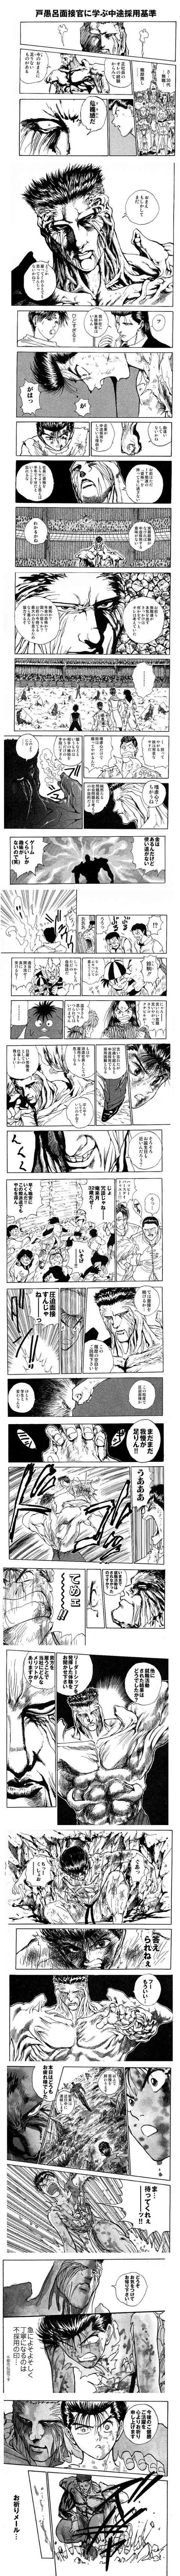 http://livedoor.blogimg.jp/vipper4news/imgs/3/3/337ae58a-s.jpg